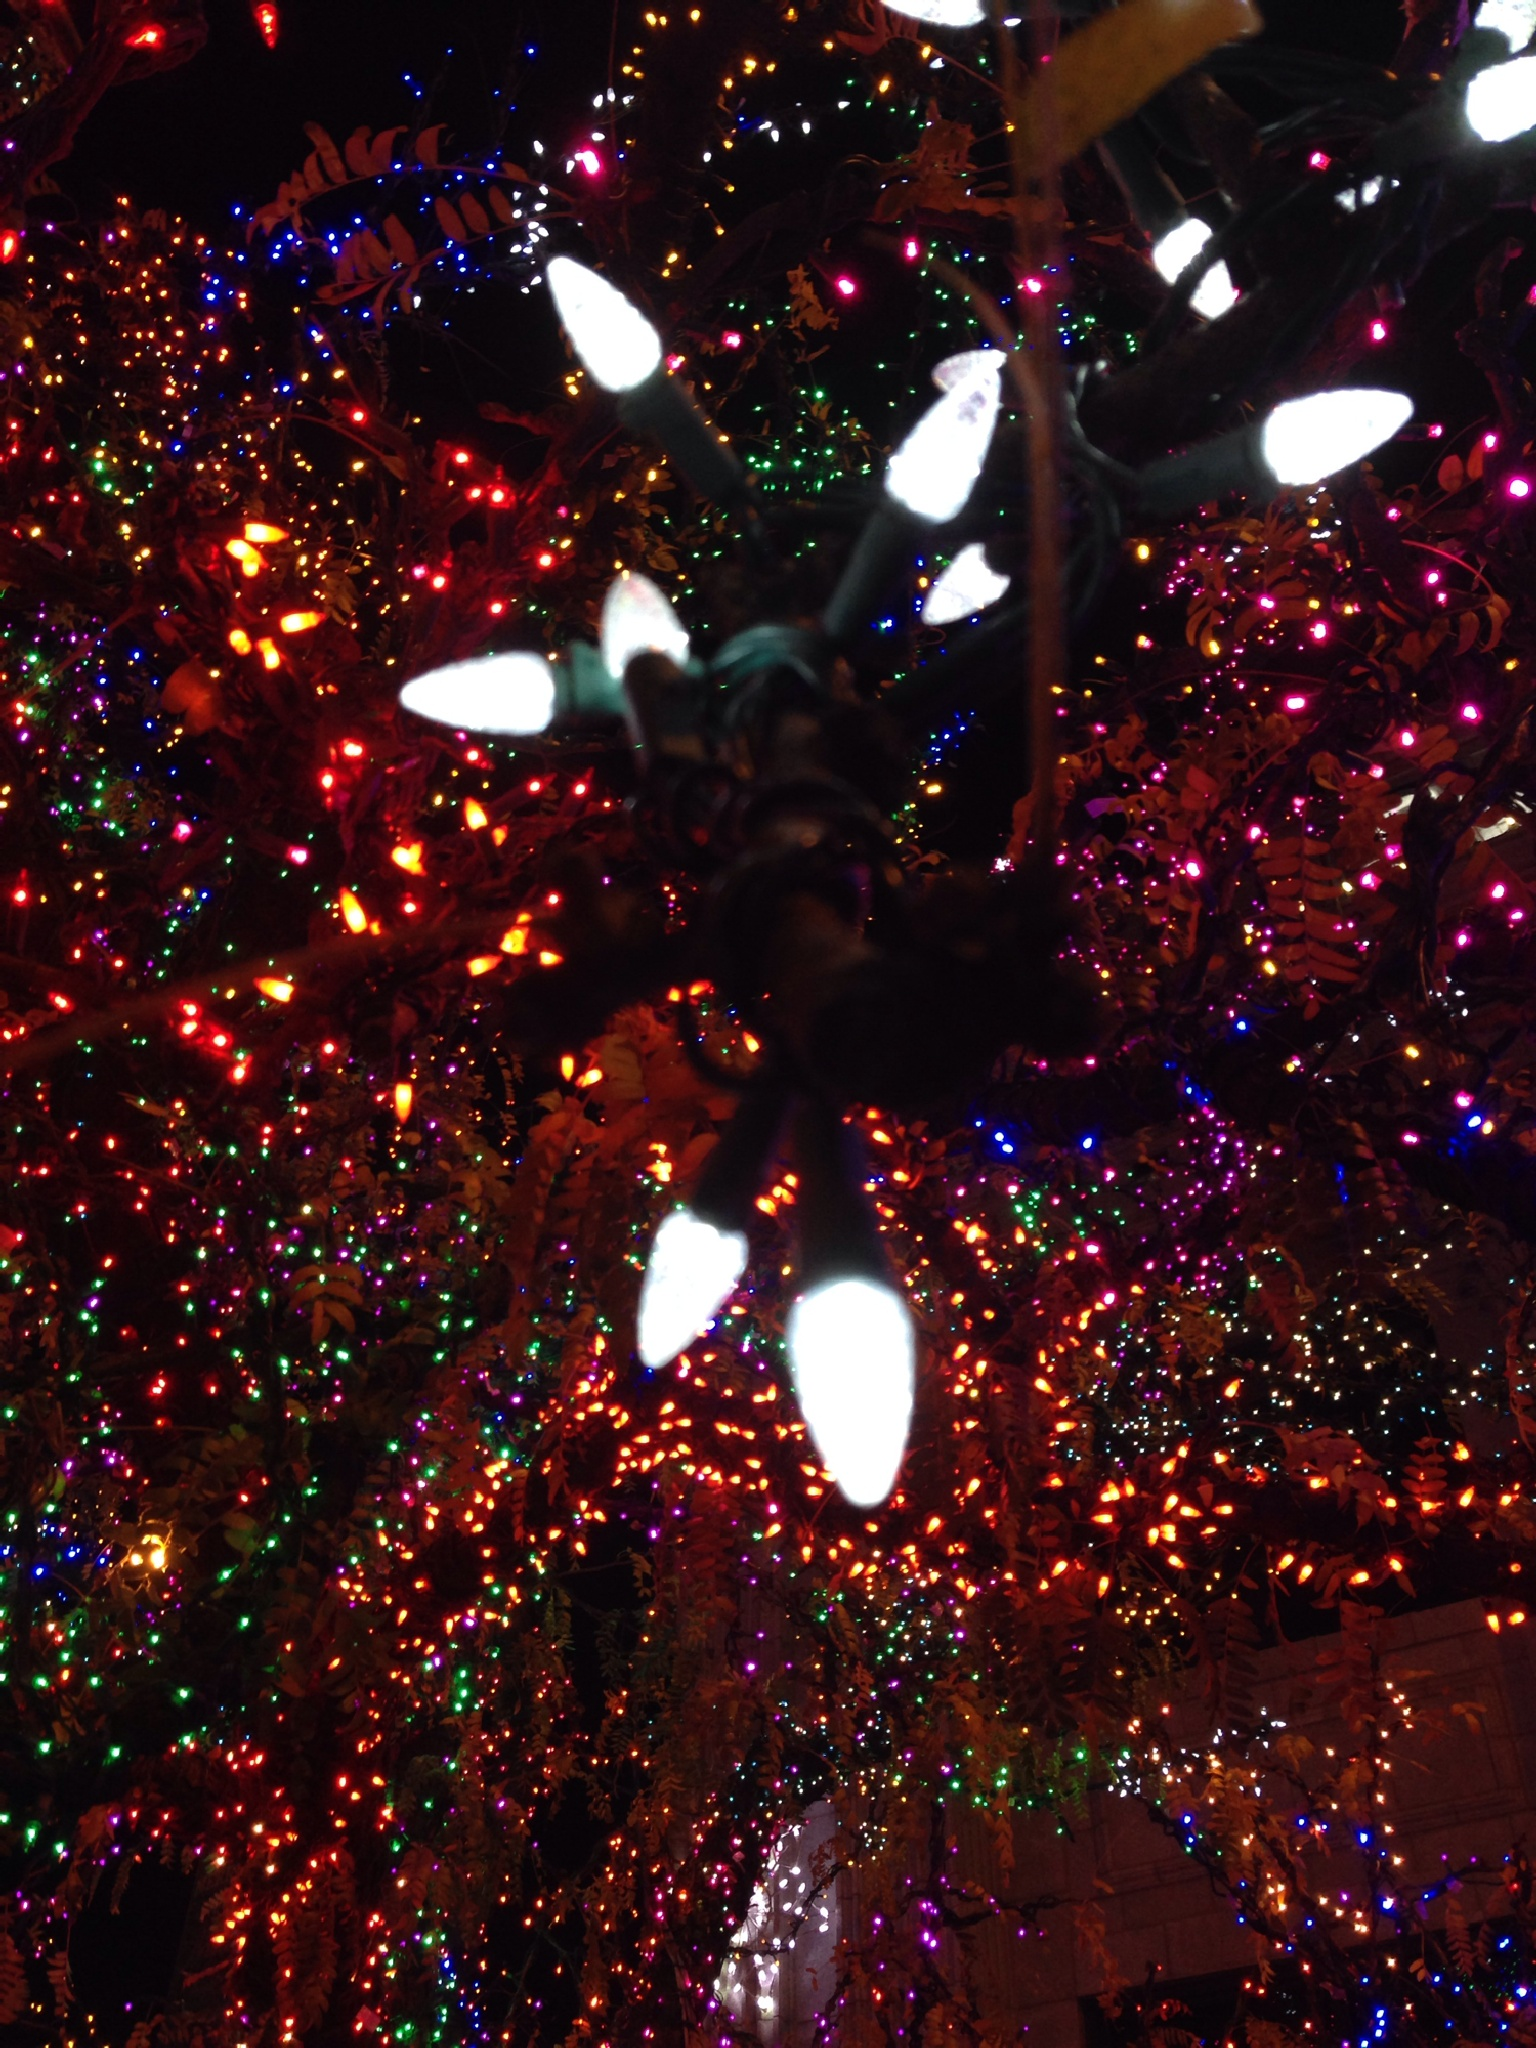 Christmas lights bringing Christmas joy by Rosekirk